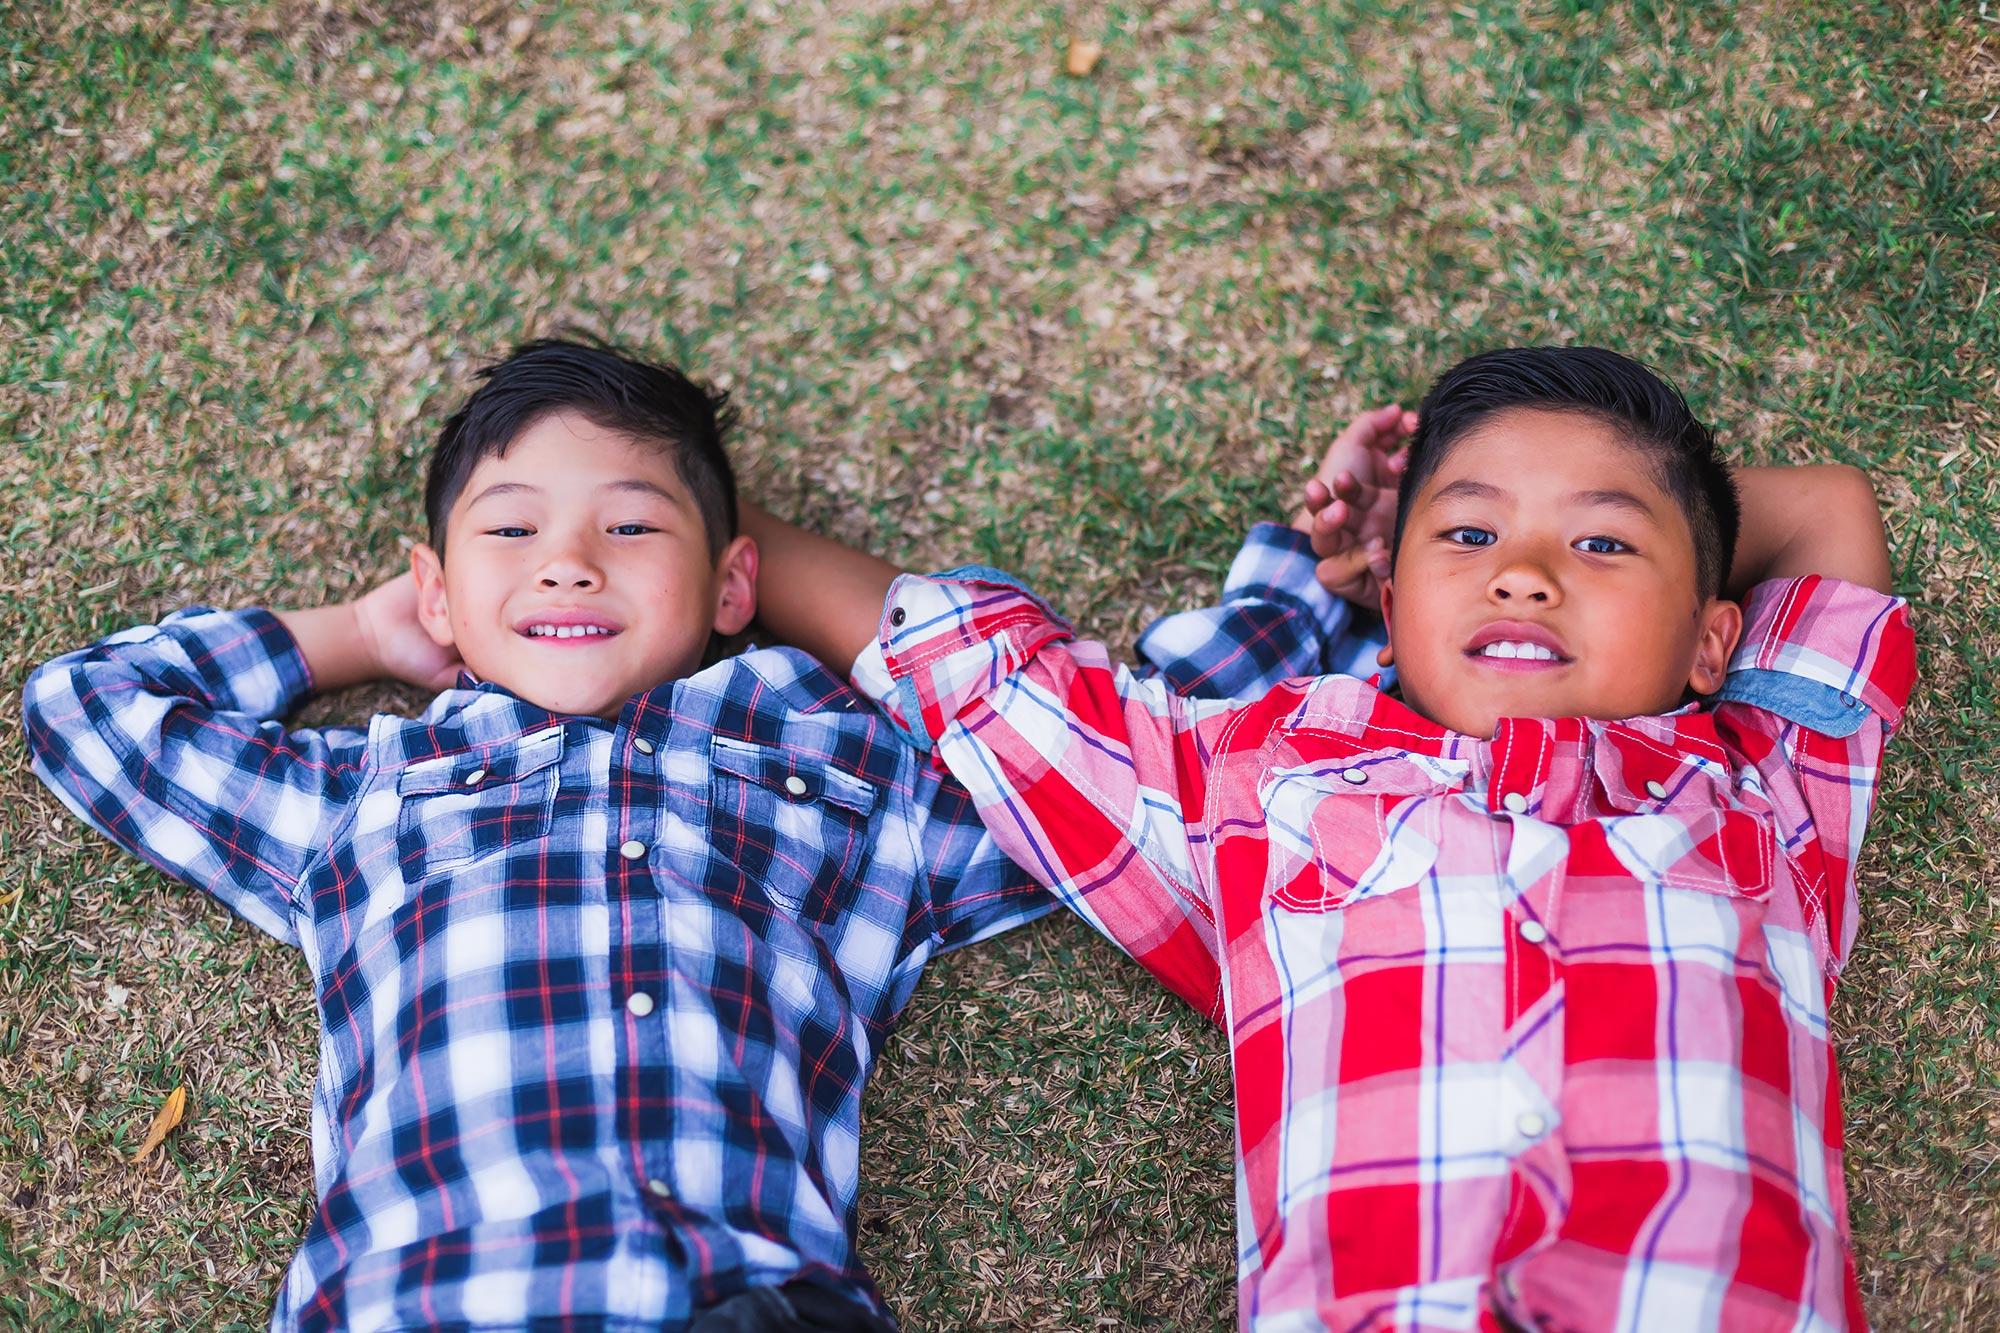 Portsmouth Children's Birthday Photographer   Stephen Grant Photography